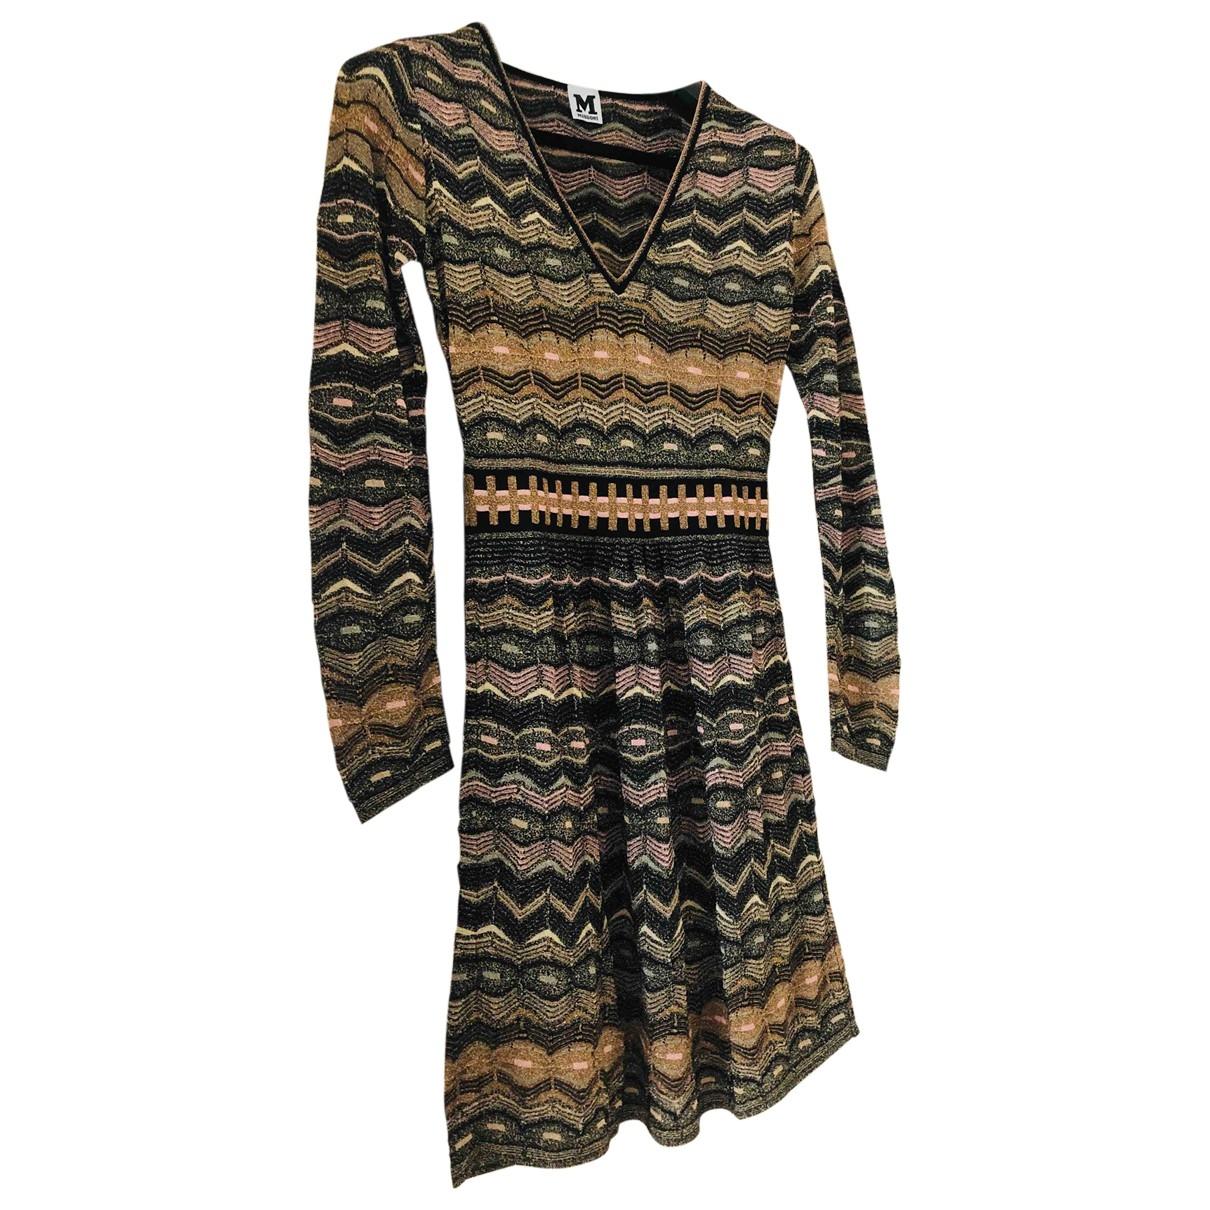 M Missoni \N Gold Cotton dress for Women 42 FR